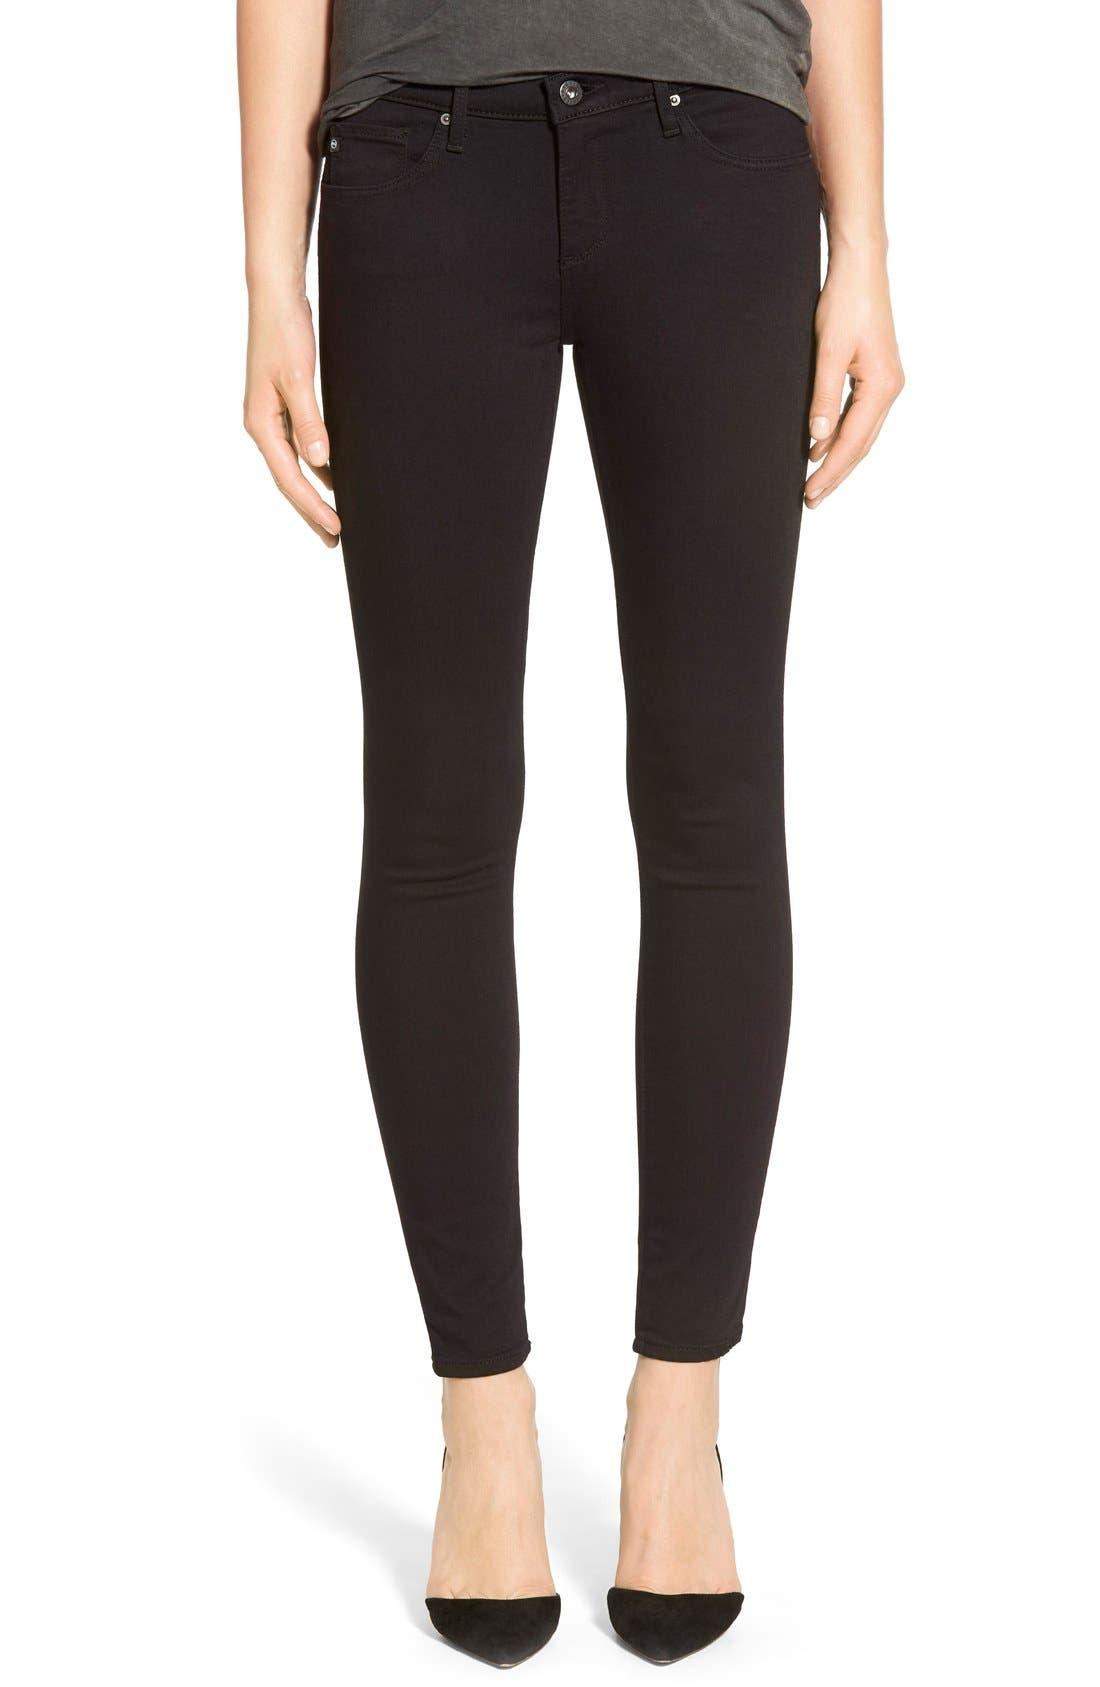 Alternate Image 1 Selected - AG 'The Legging' Ankle Super Skinny Jeans (Super Black)